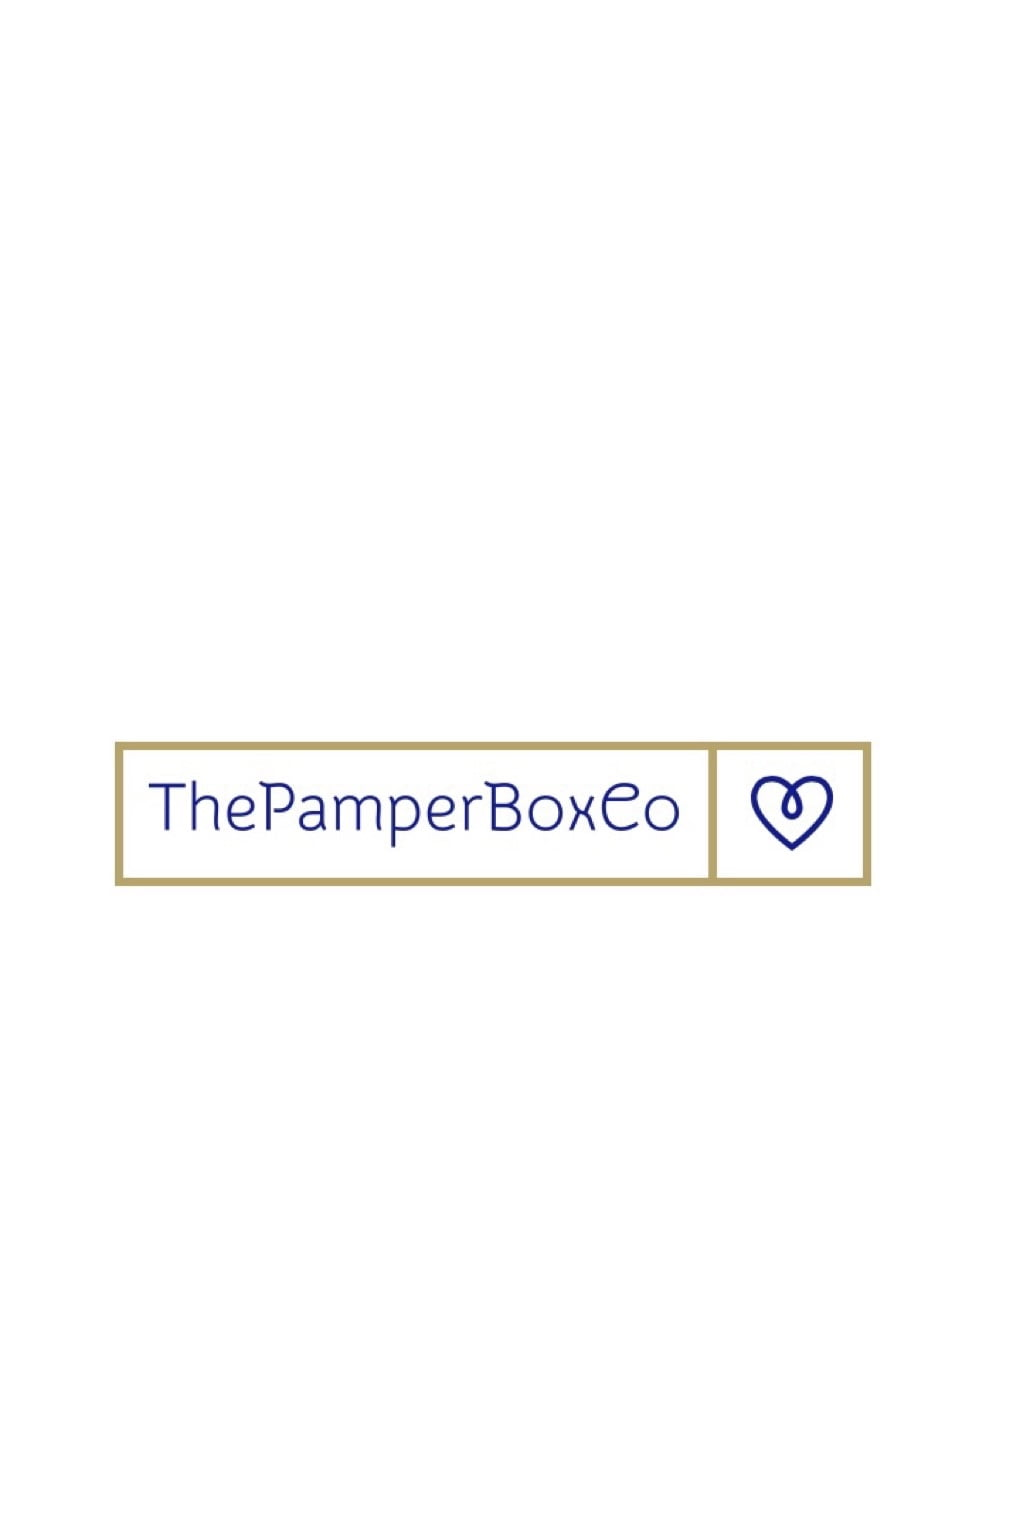 ThePamperBoxCo